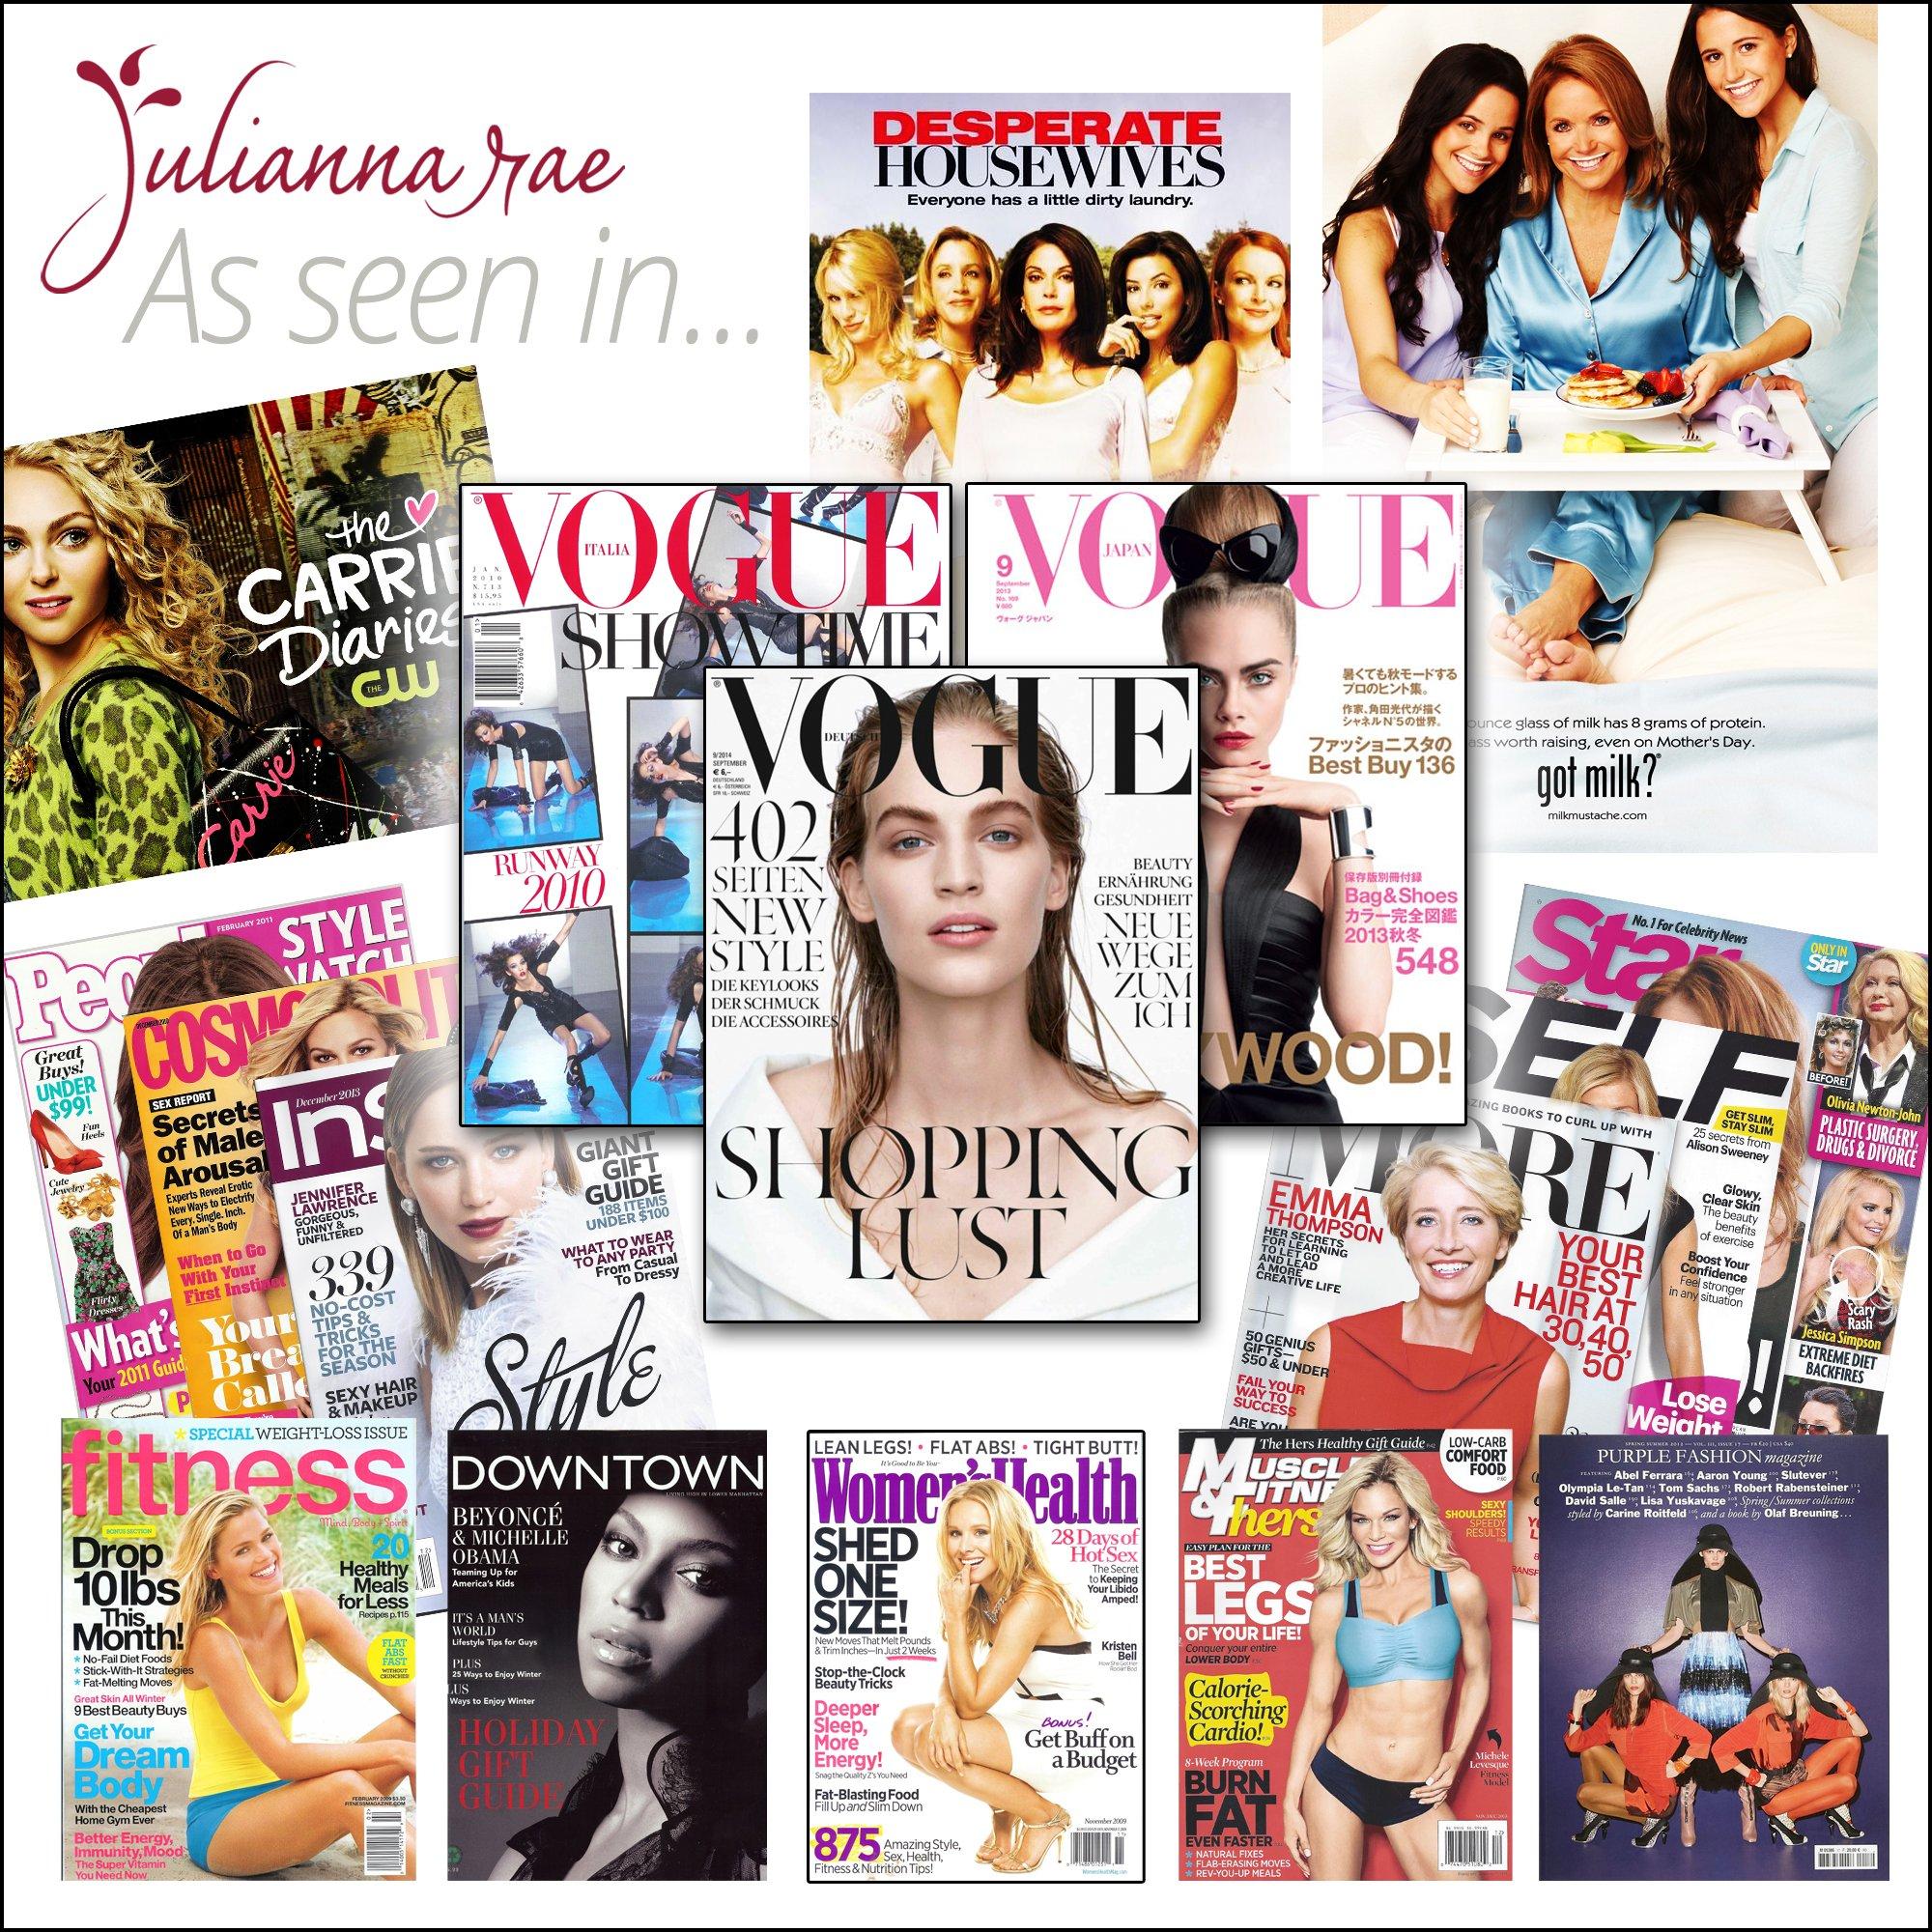 Julianna Rae Women's 100% Silk Contrast Cami Top, Lace Trim, Flattering Fit, Le Tresor Collection, Parisian, M by Julianna Rae (Image #5)